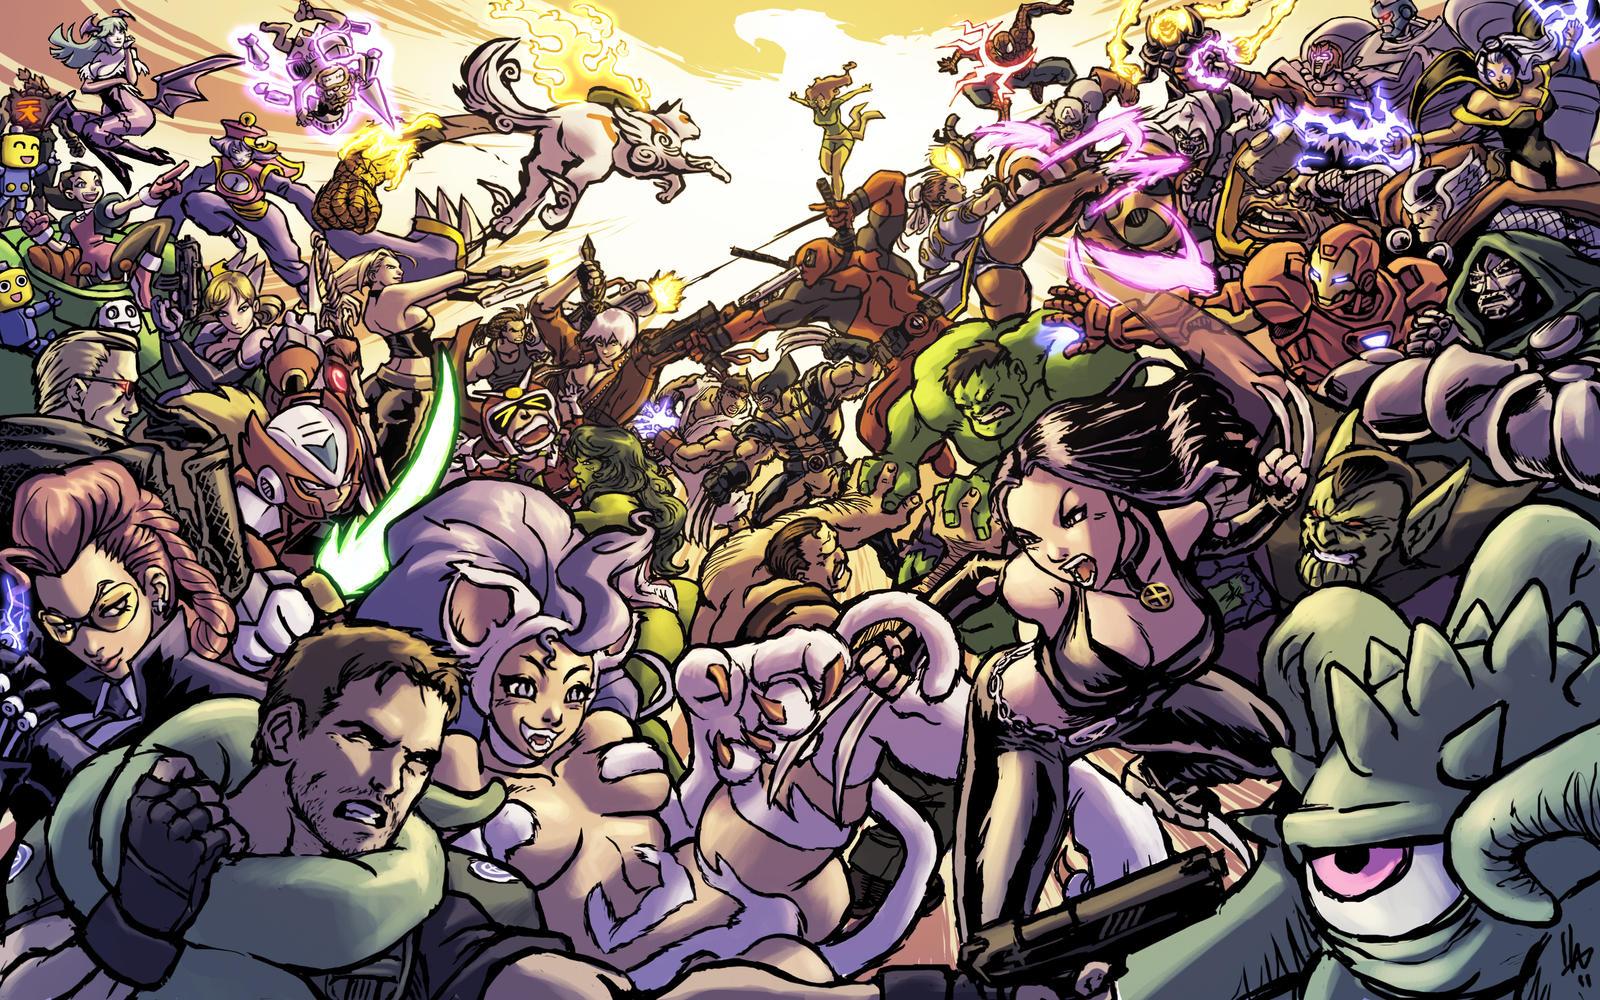 Ultimate Marvel Vs Capcom 3 Available Now On Xbl And Psnoh Wait Infinite Reg